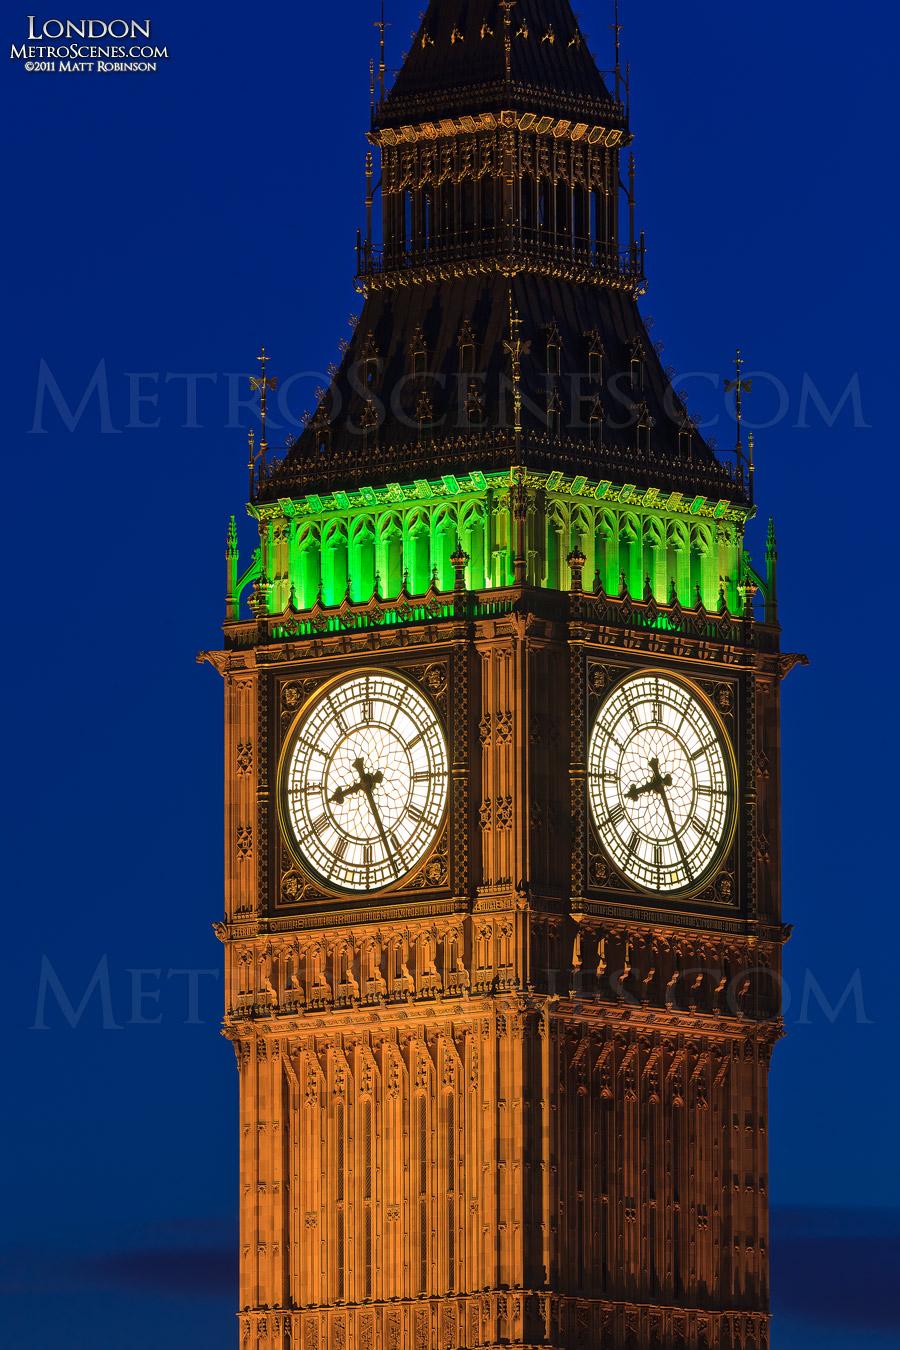 Detail of the Clock-face of Big Ben